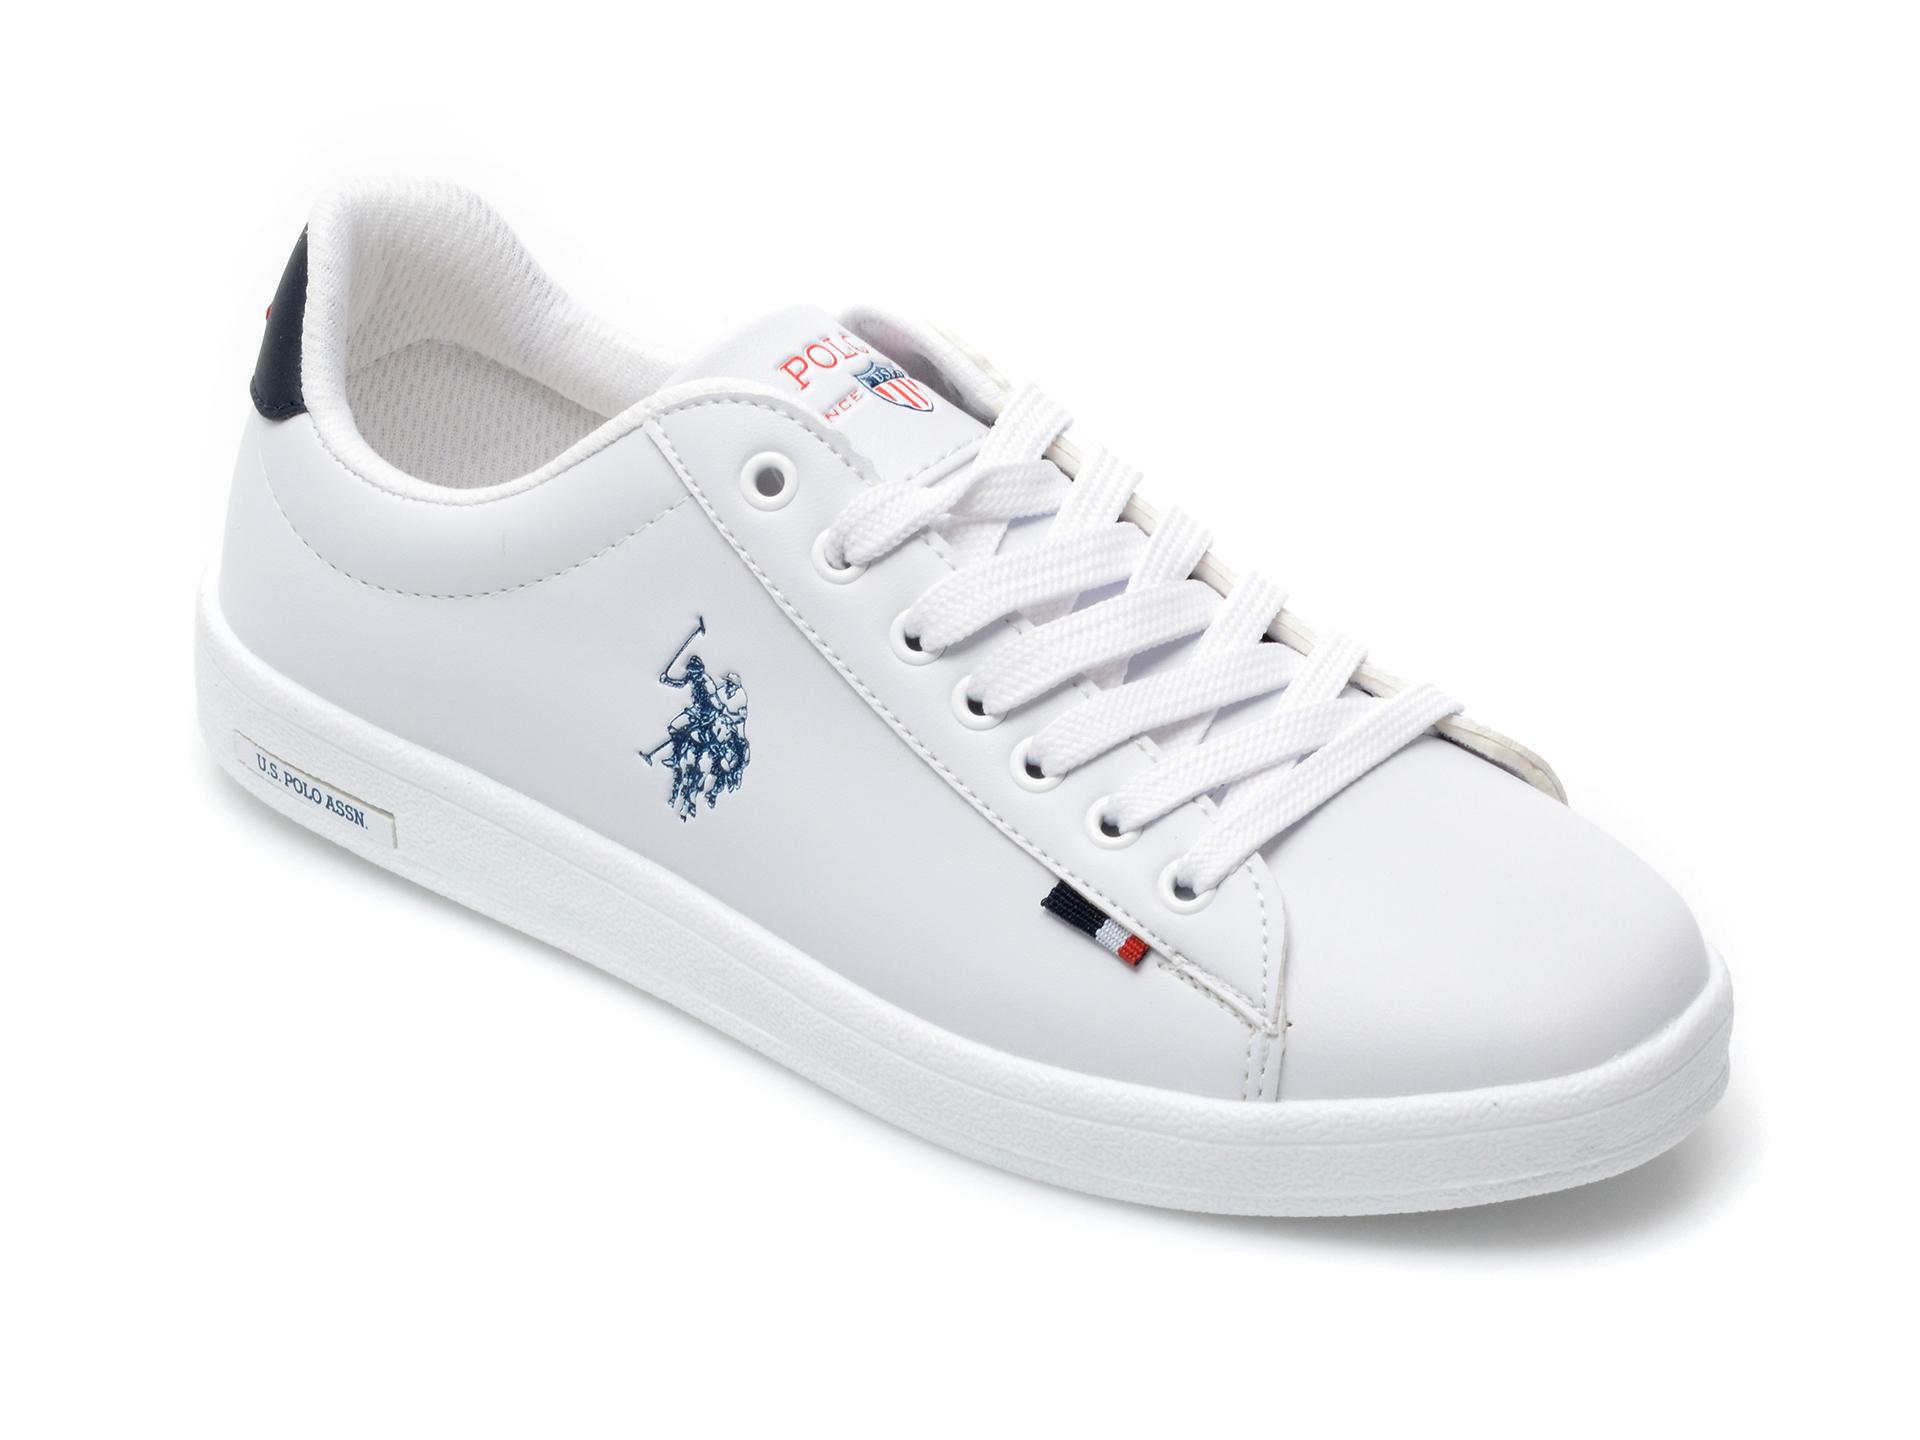 Pantofi sport US POLO ASSN albi, FRAWM1F, din piele ecologica imagine otter.ro 2021